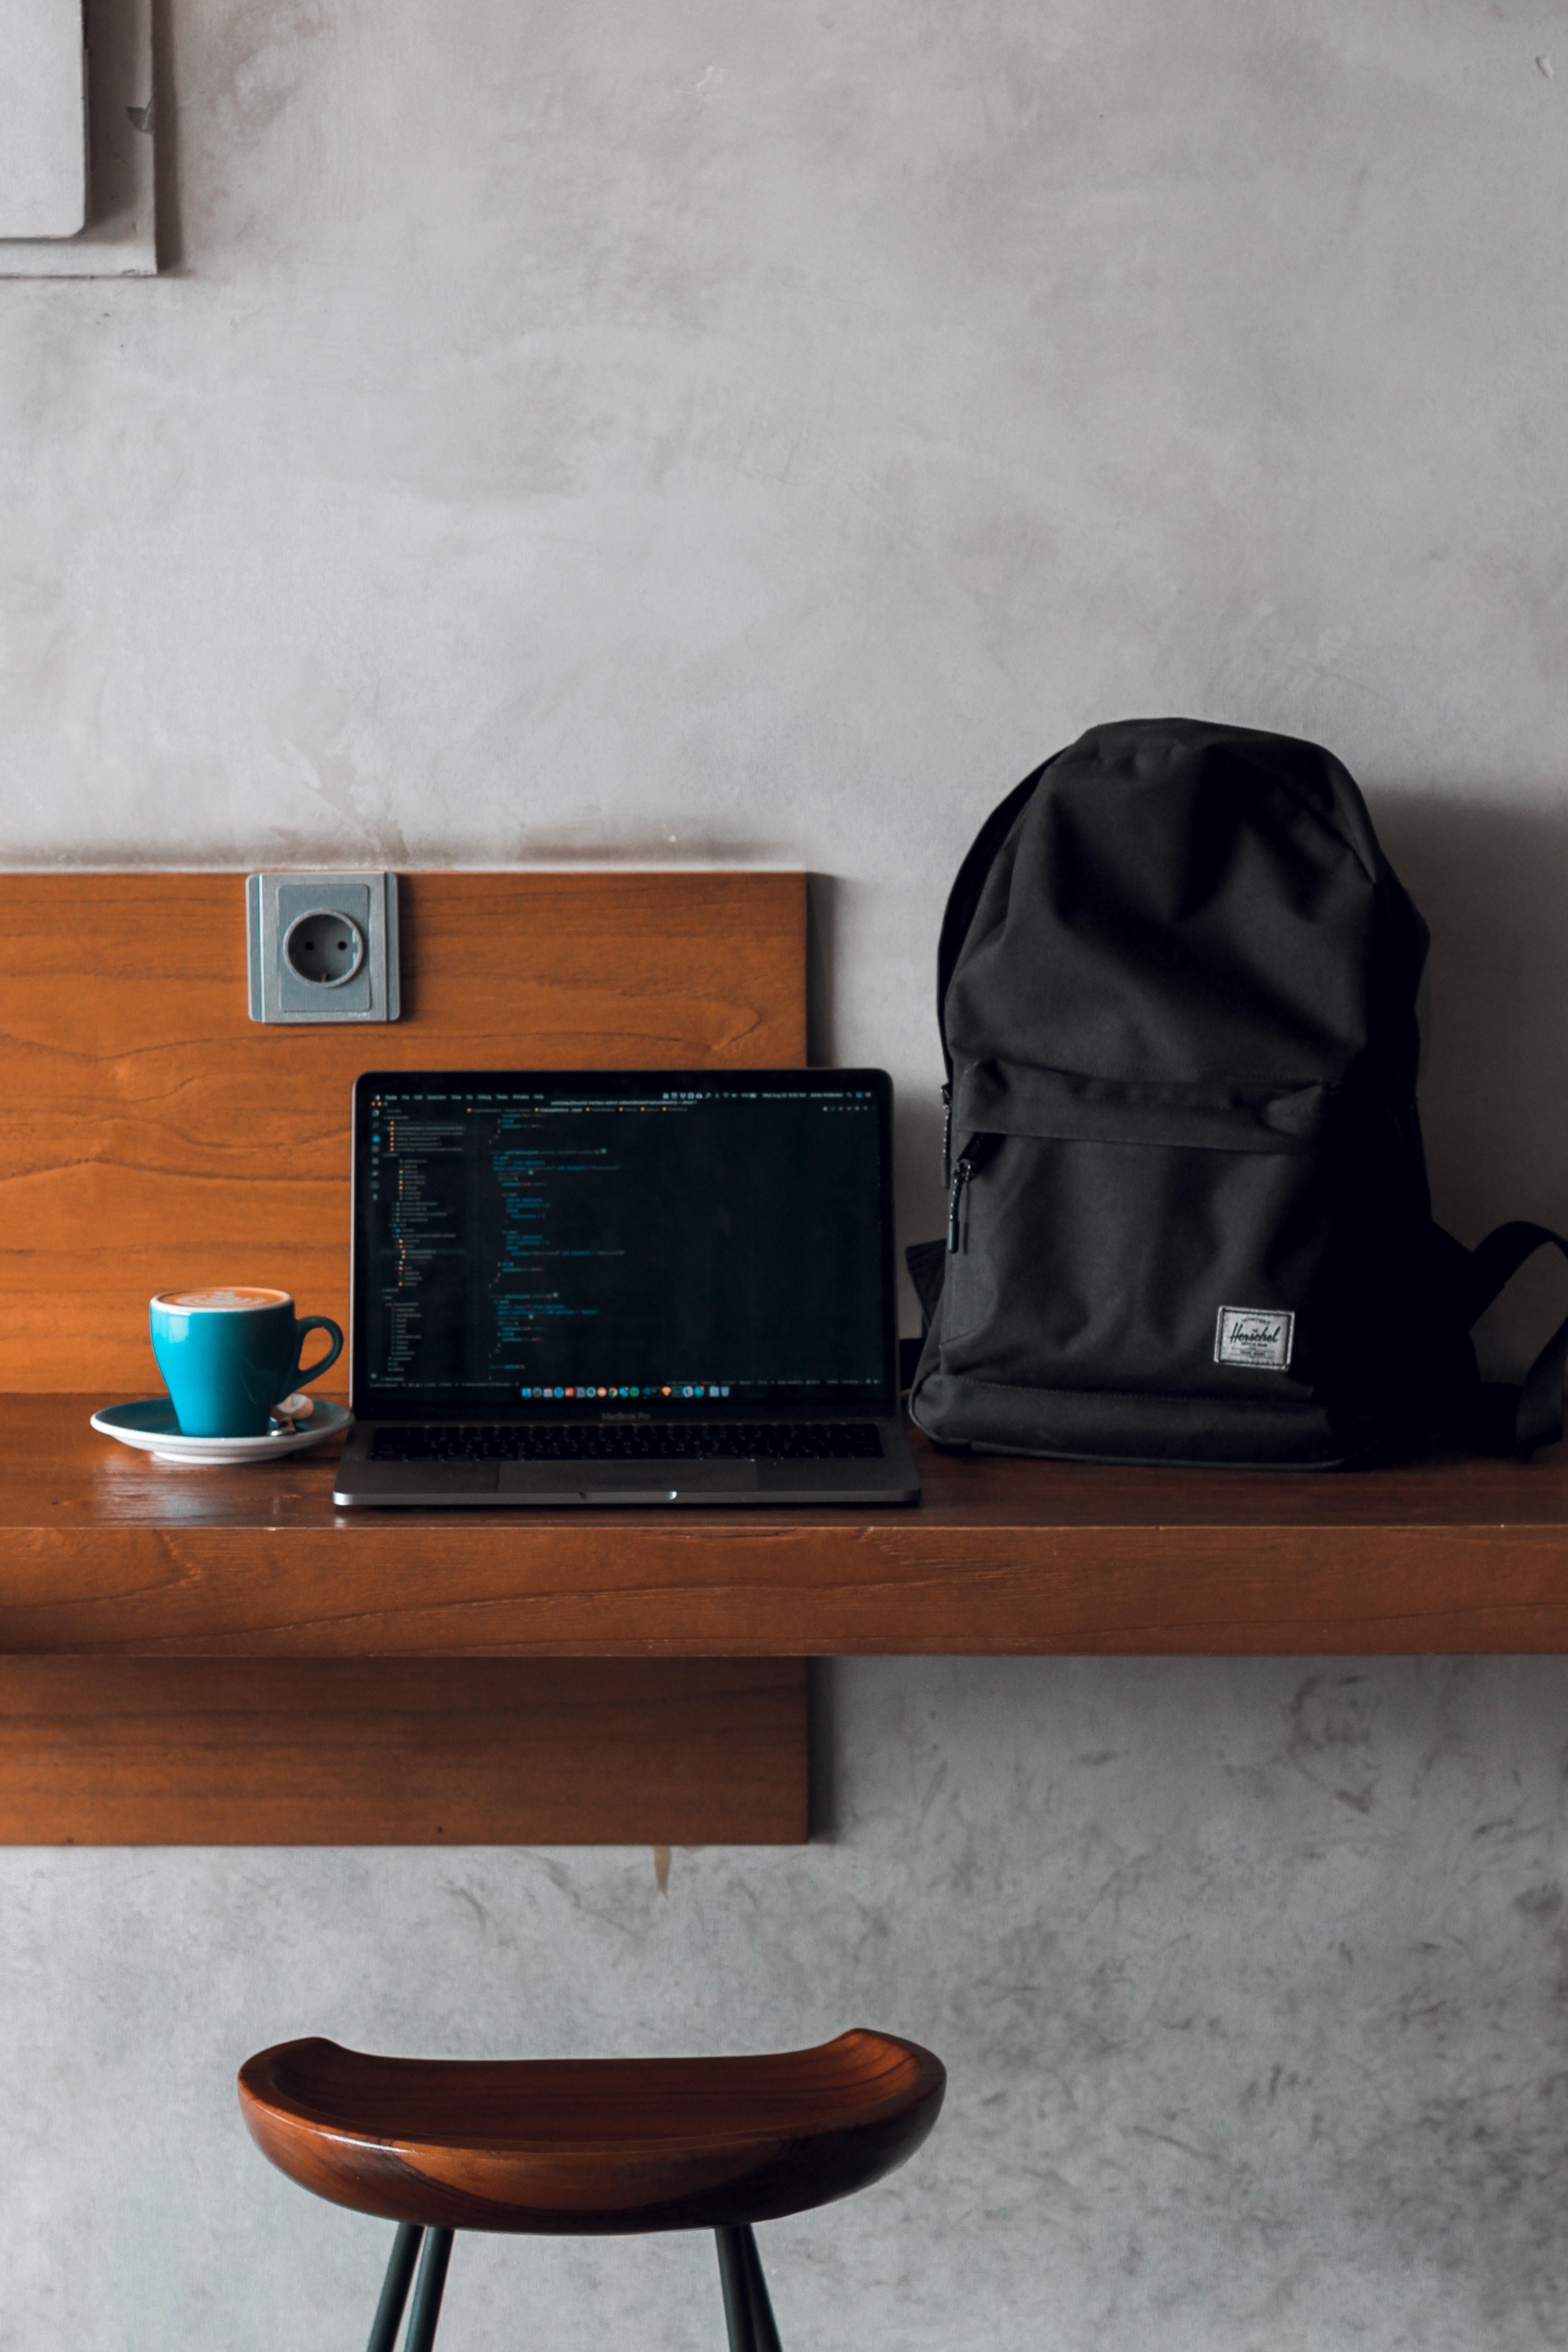 coffee shop computer code